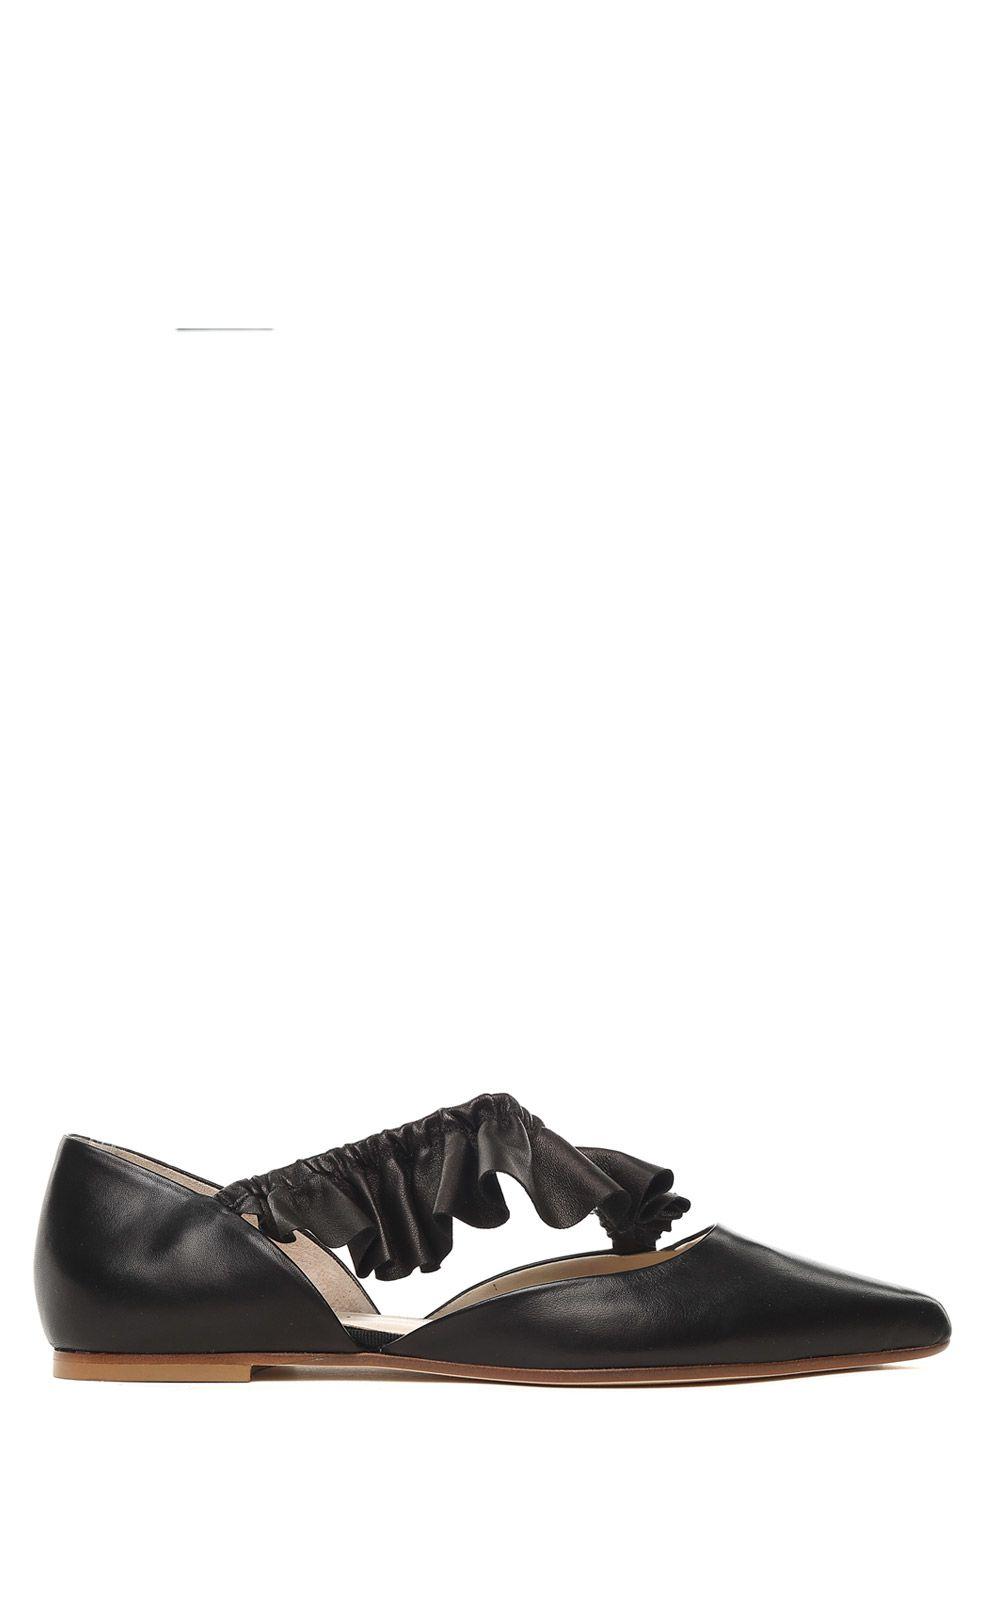 Malika uched leather ballet flats Anna Baiguera zhgEC554Nr